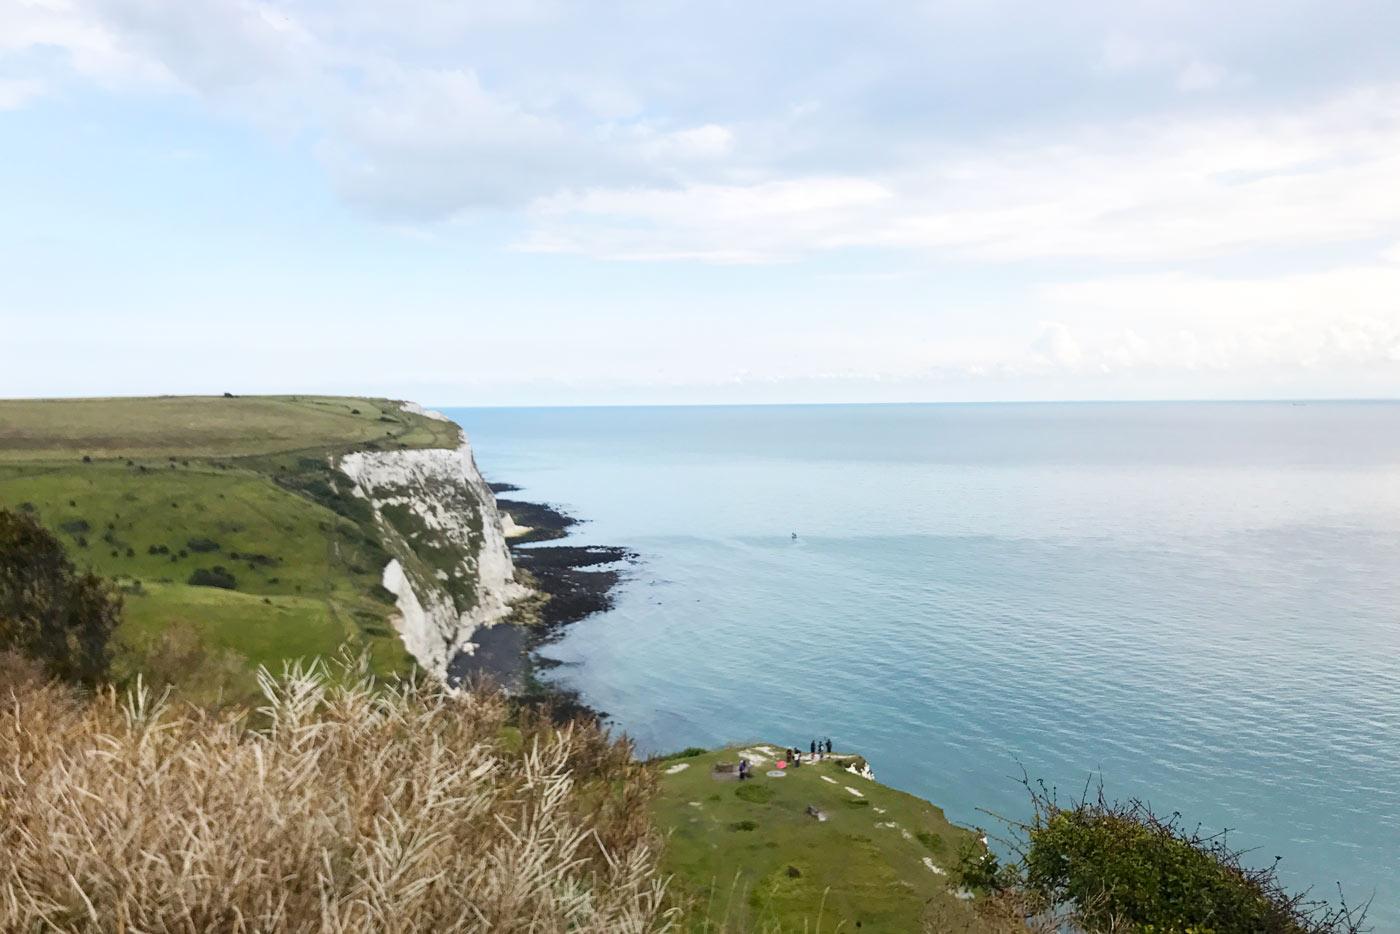 Cliffs dover